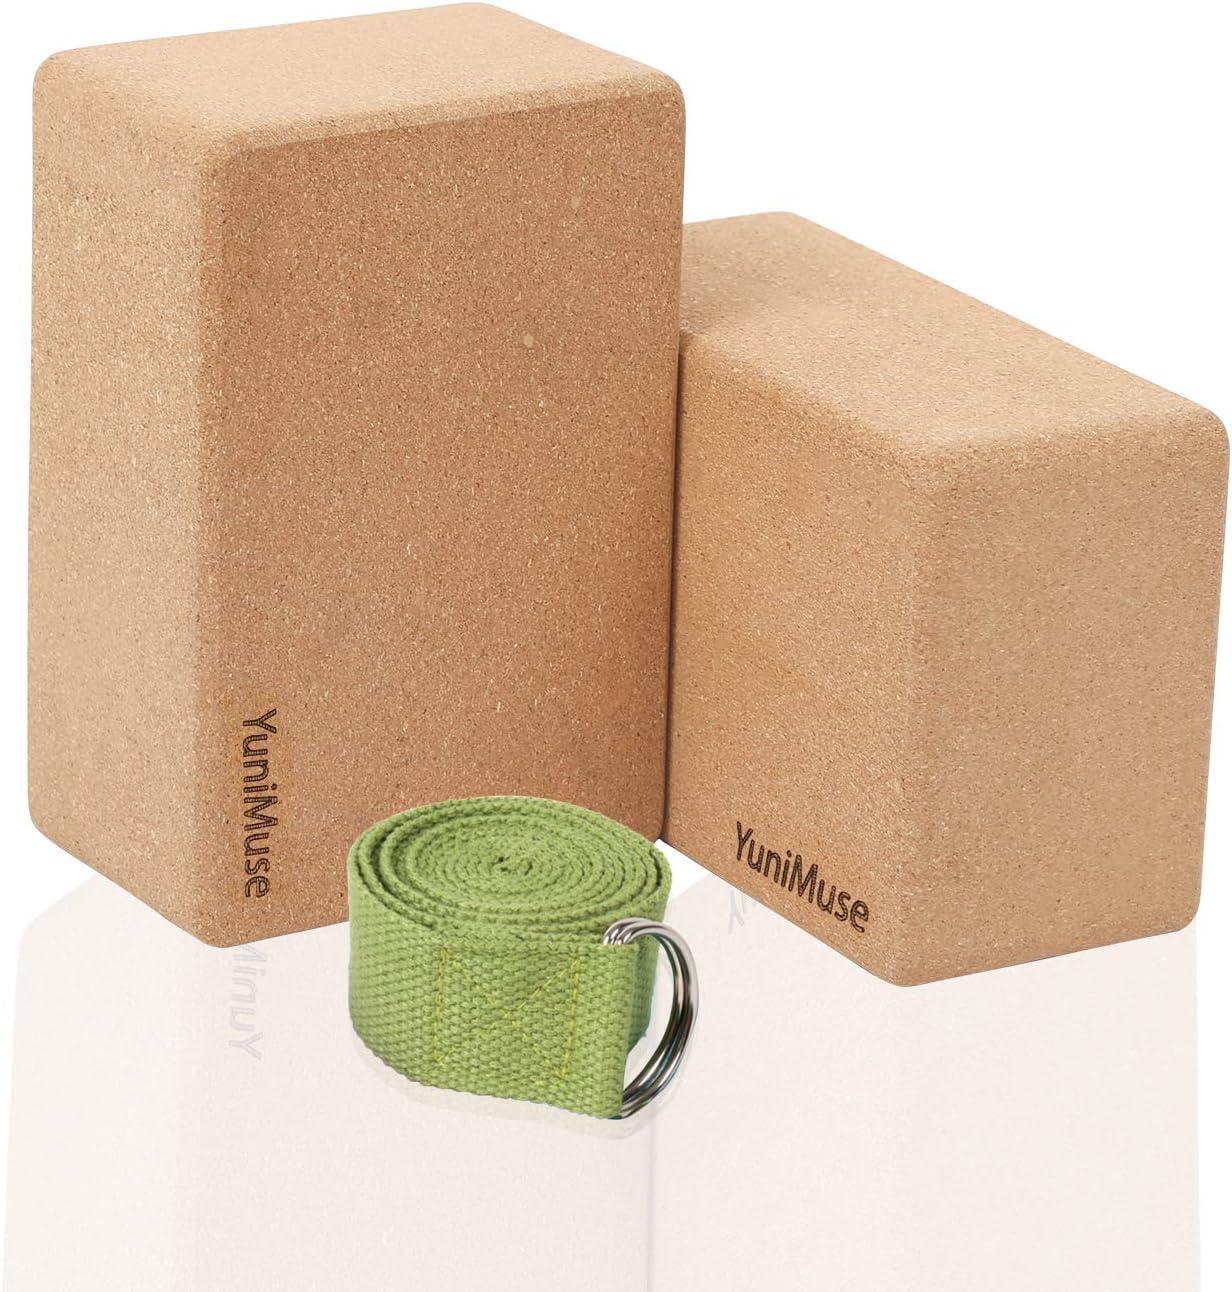 Cork Yoga Blocks 2 Pack with Strap YuniMuse Yoga Blocks Yoga Set to Improve Strength Yoga Bolster Balance and Flexibility 9x6x4//3 Natural Eco-friendly High Density Cork Yoga Block Yoga Strap